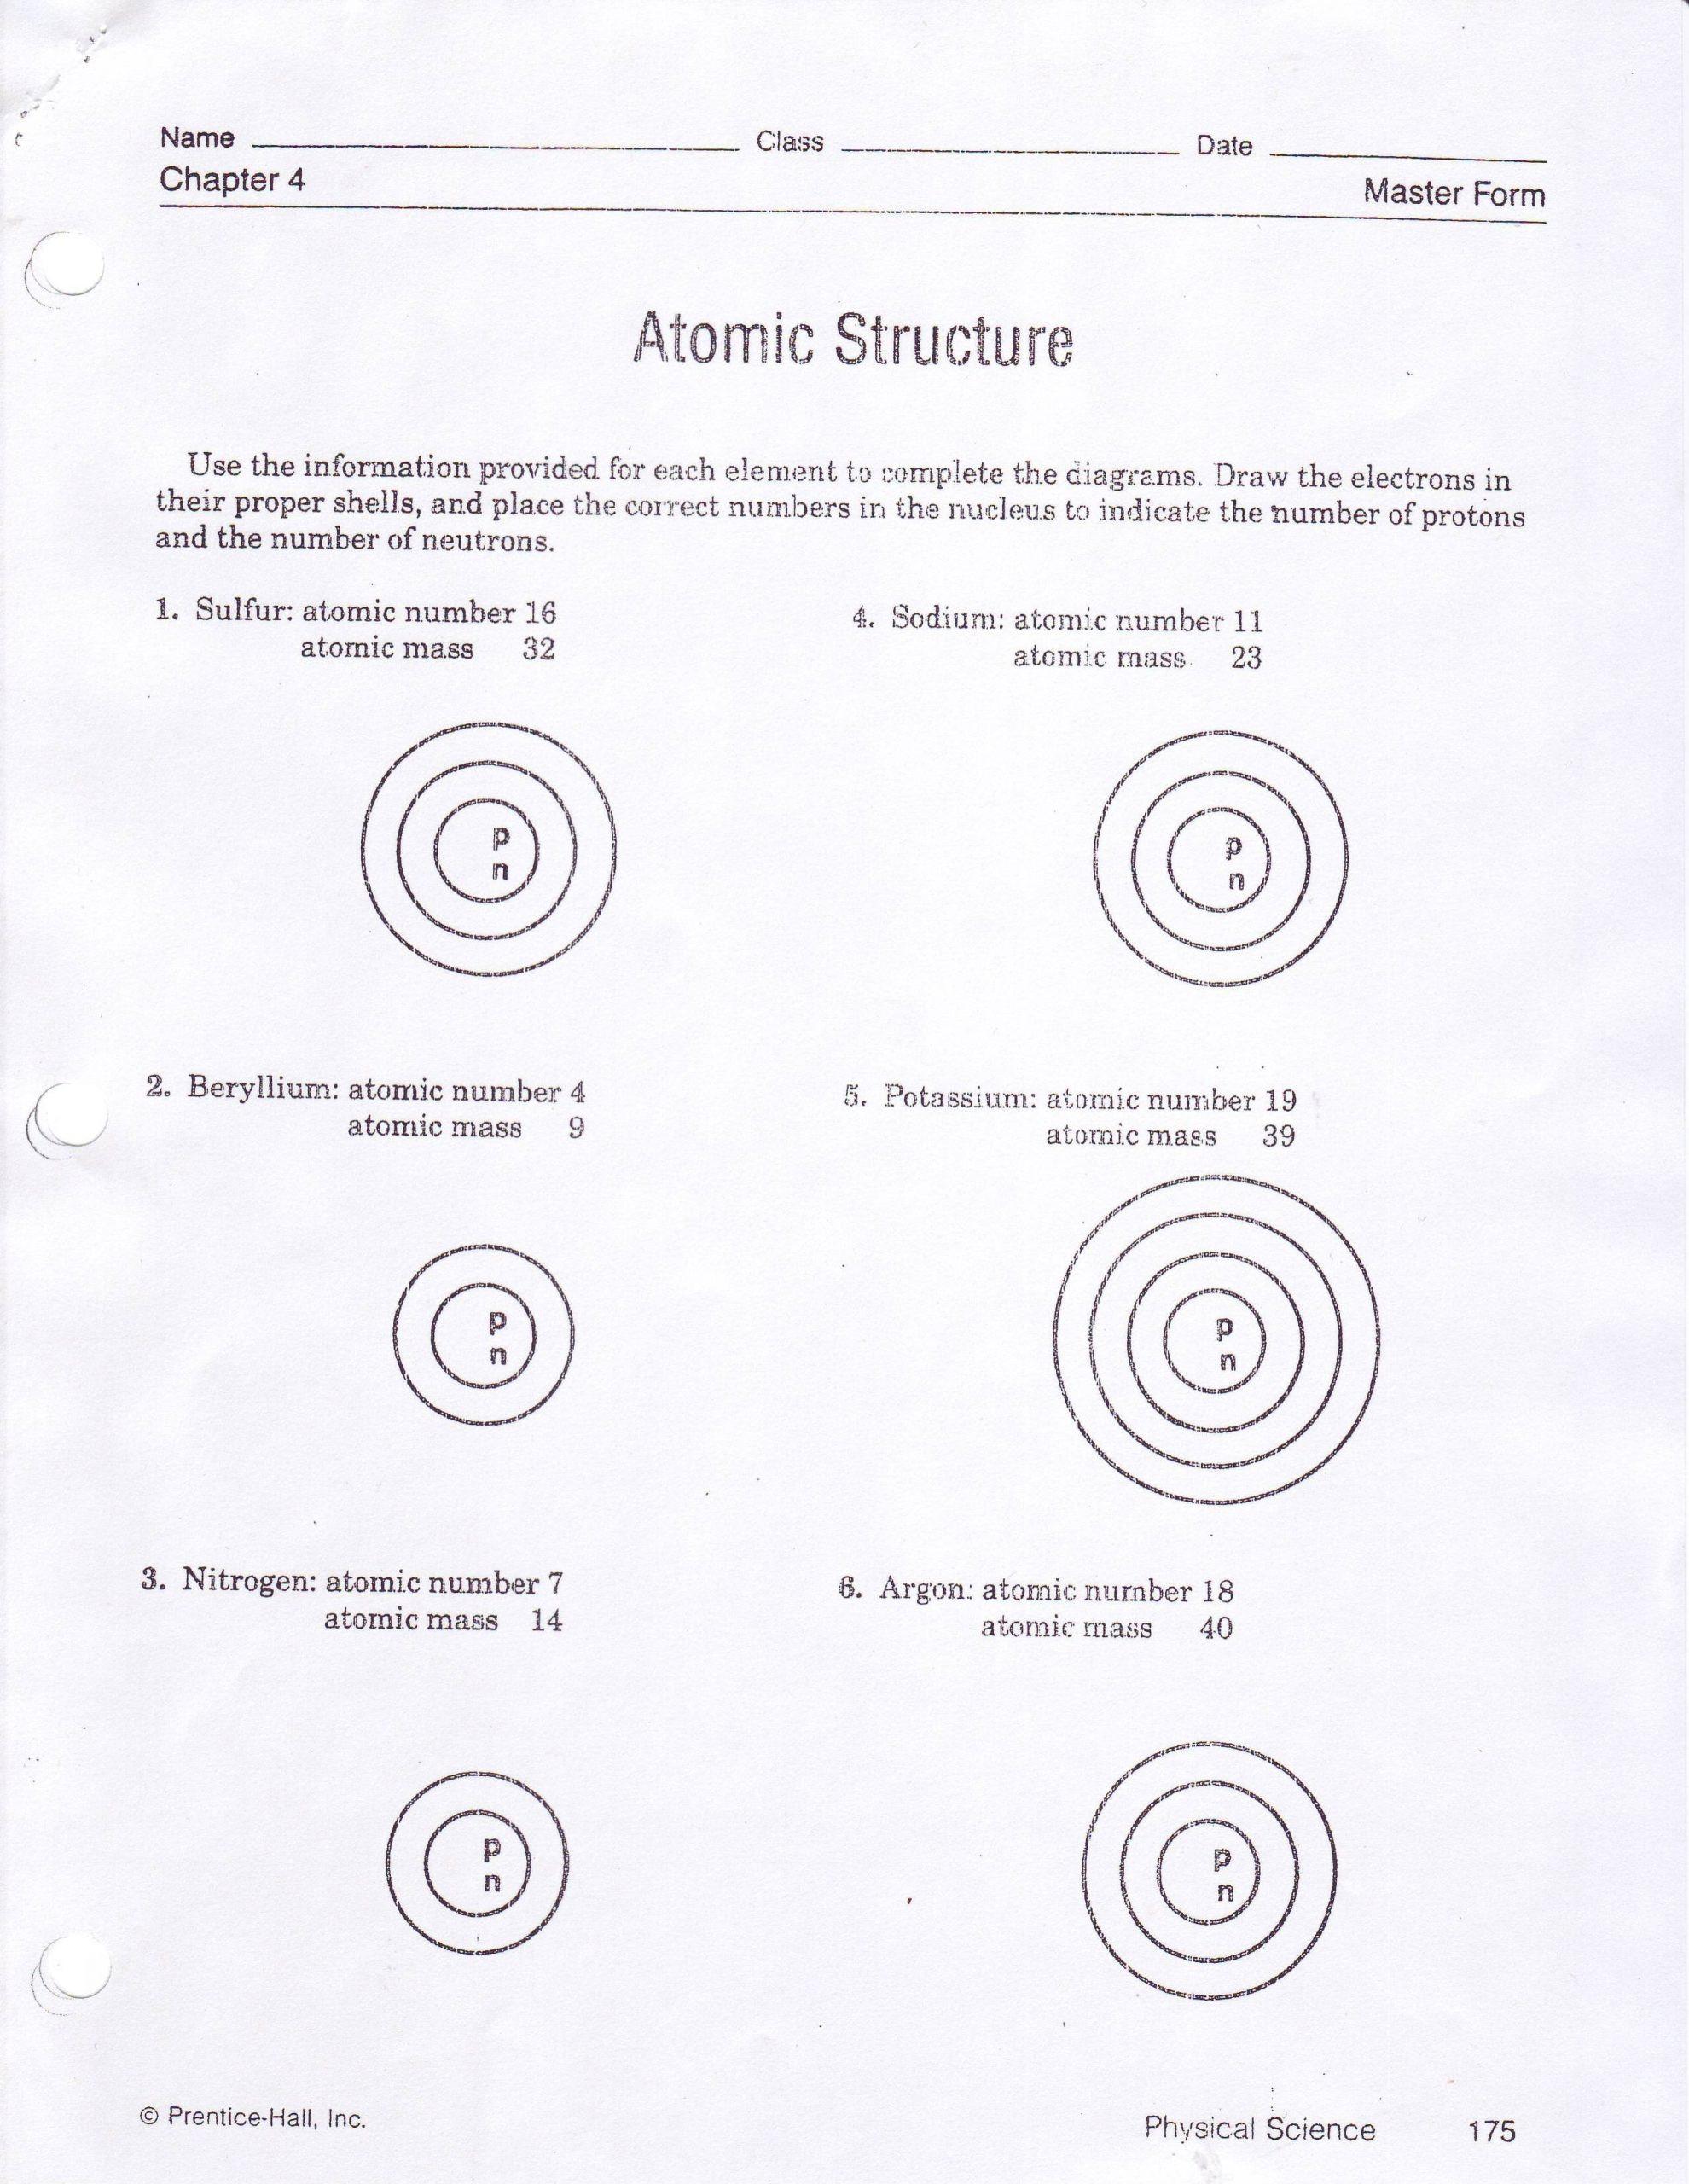 Basic atomic Structure Worksheet Answers Worksheets 42 astonishing atomic Structure Worksheet